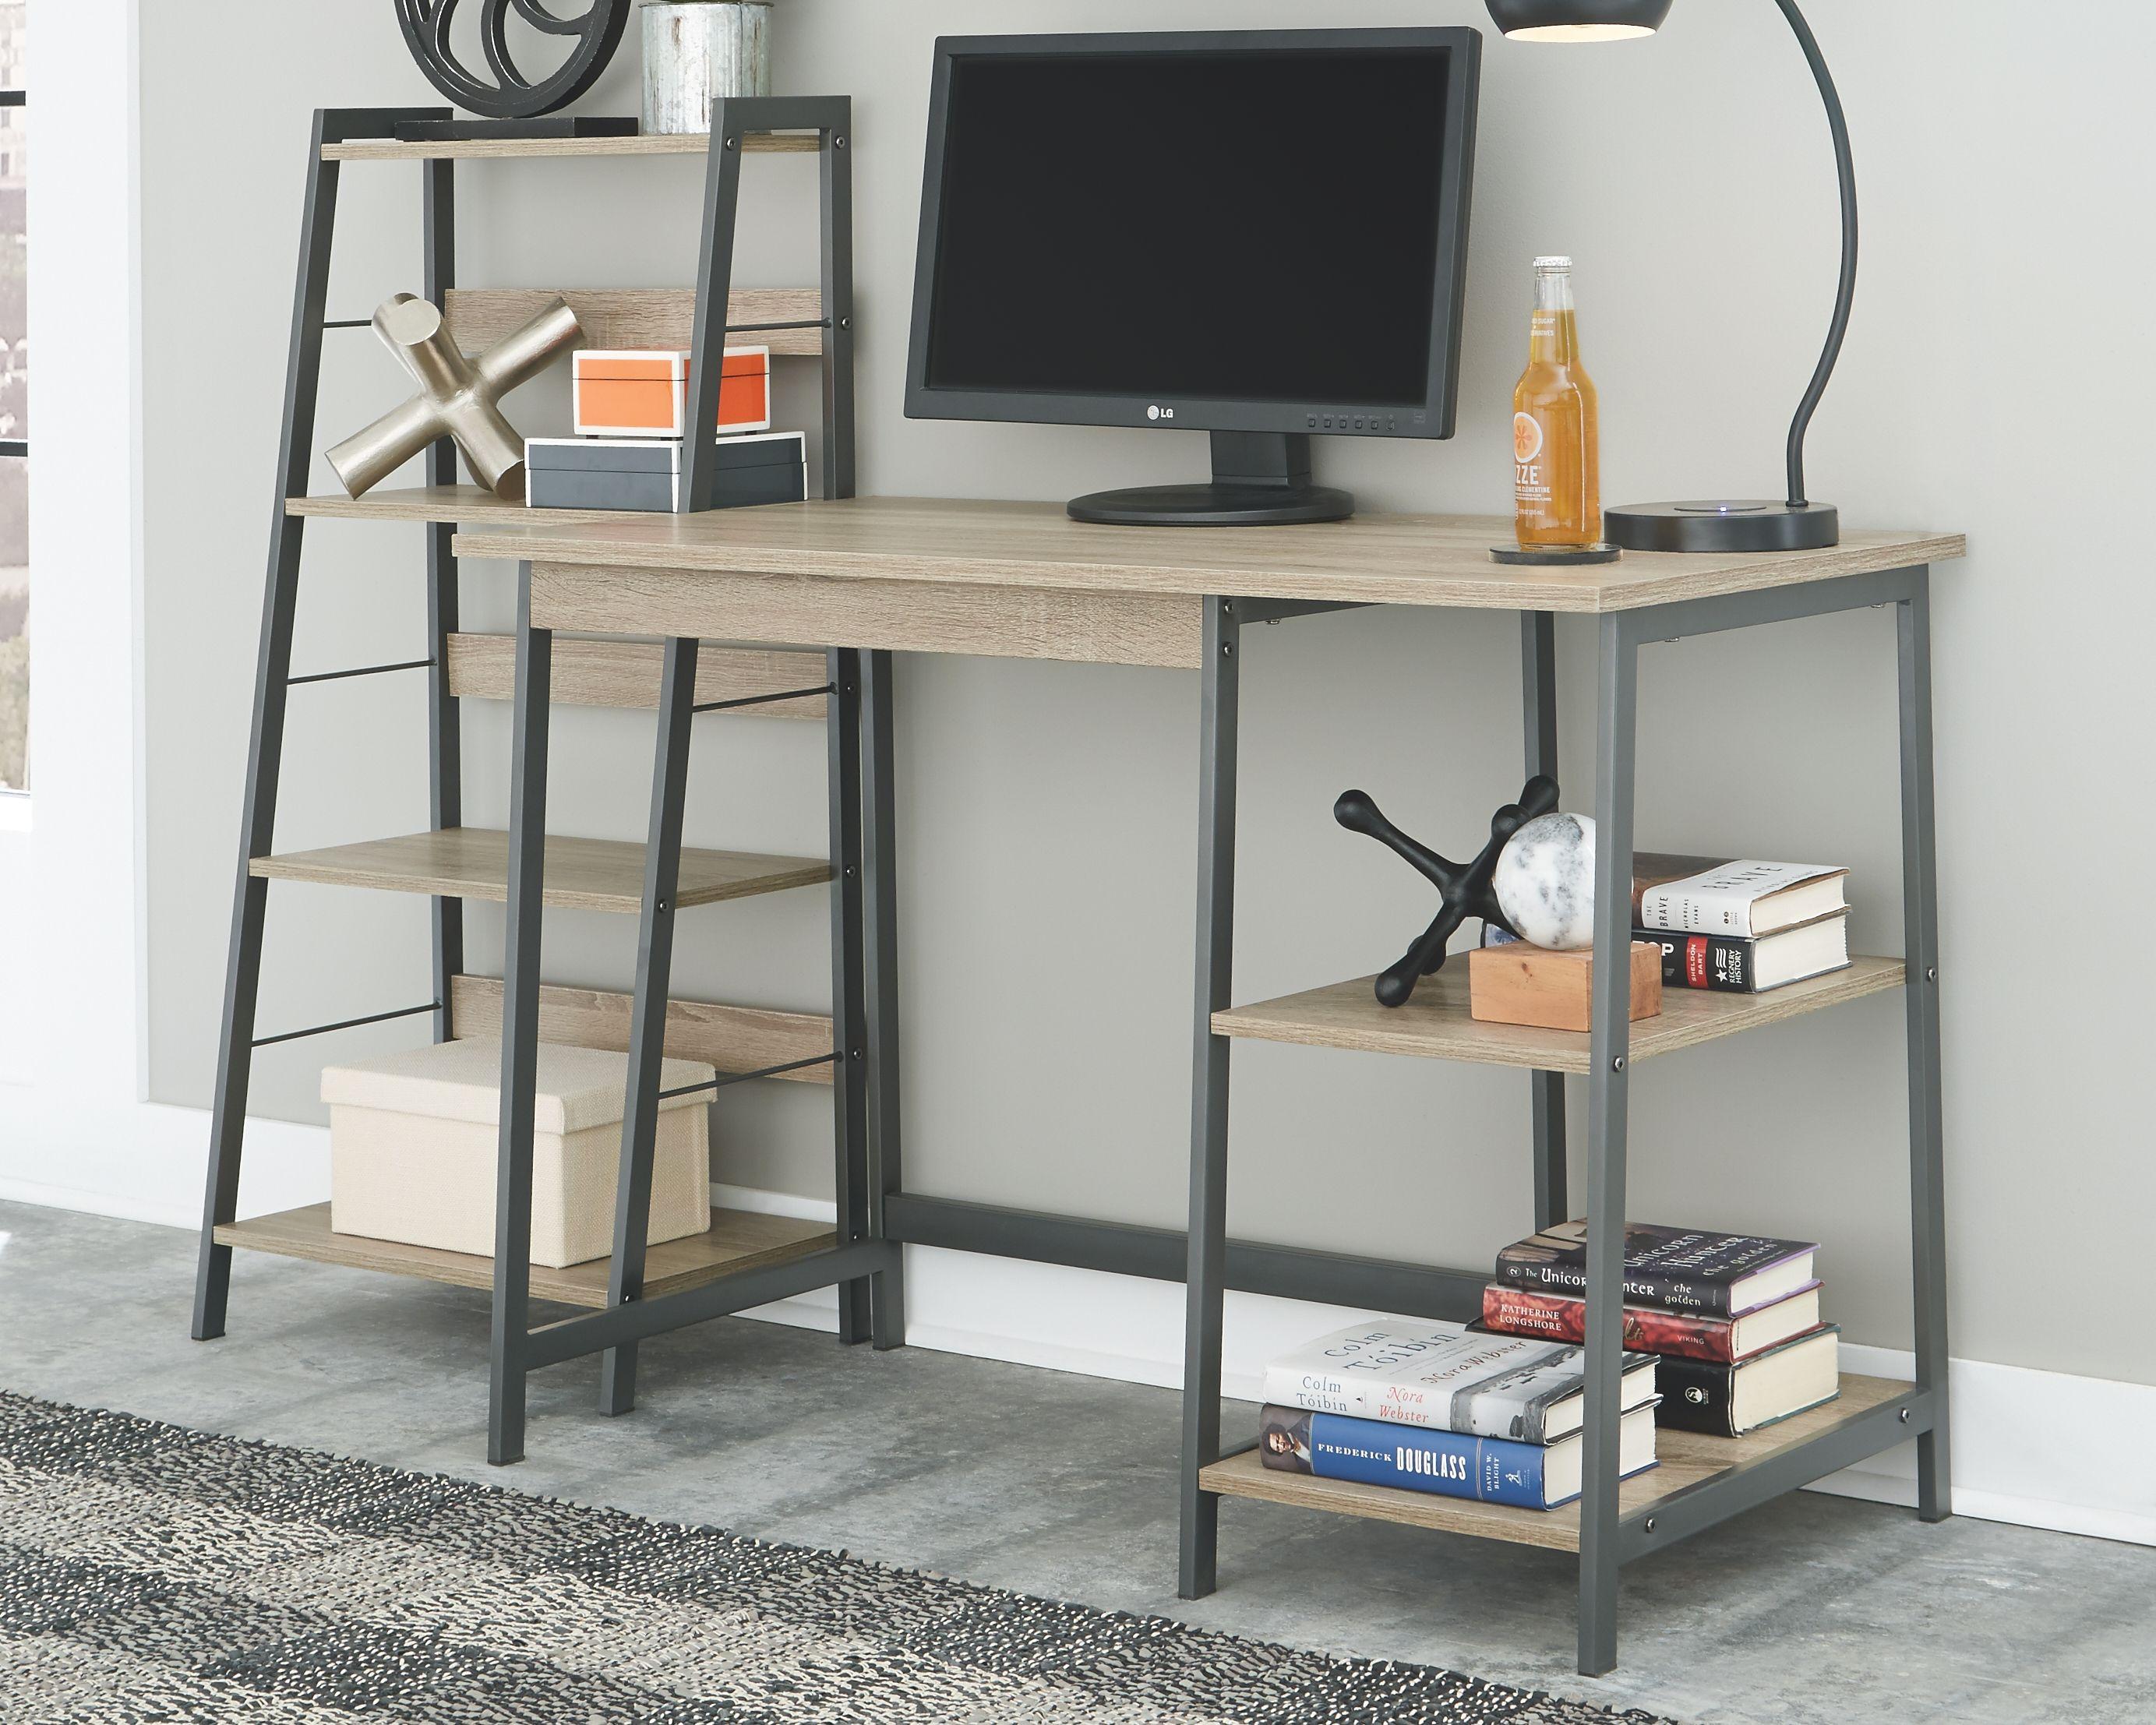 Soho Home Office Desk and Shelf